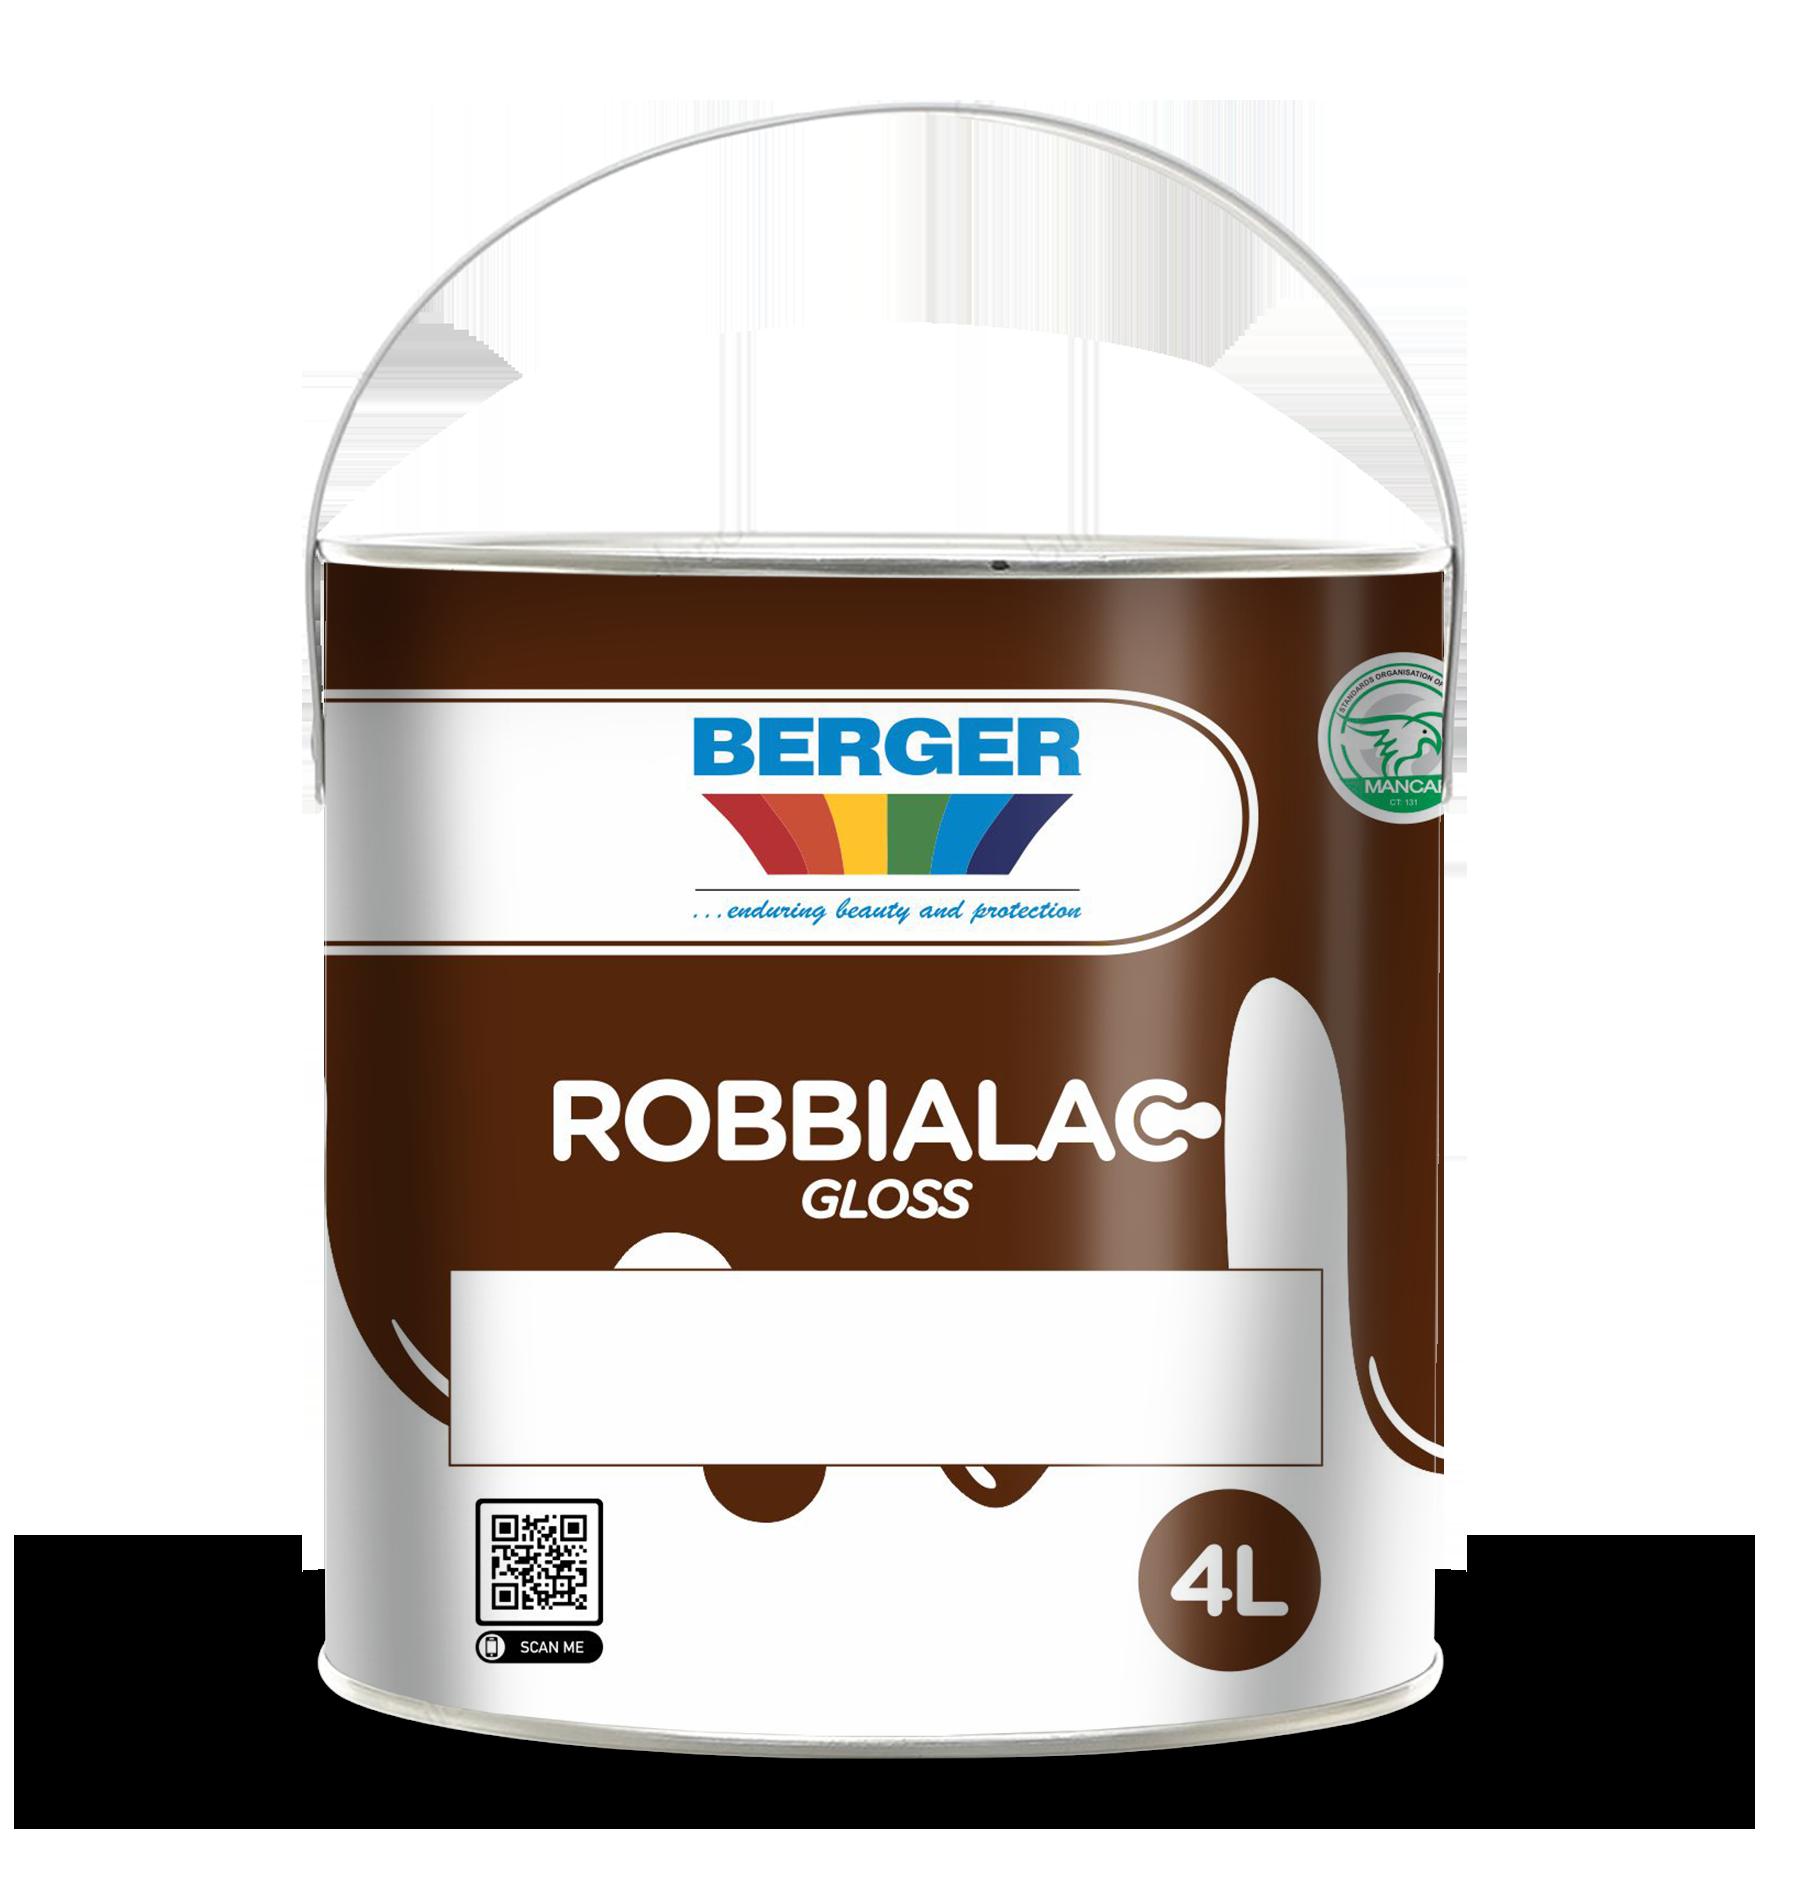 Robbialac Gloss